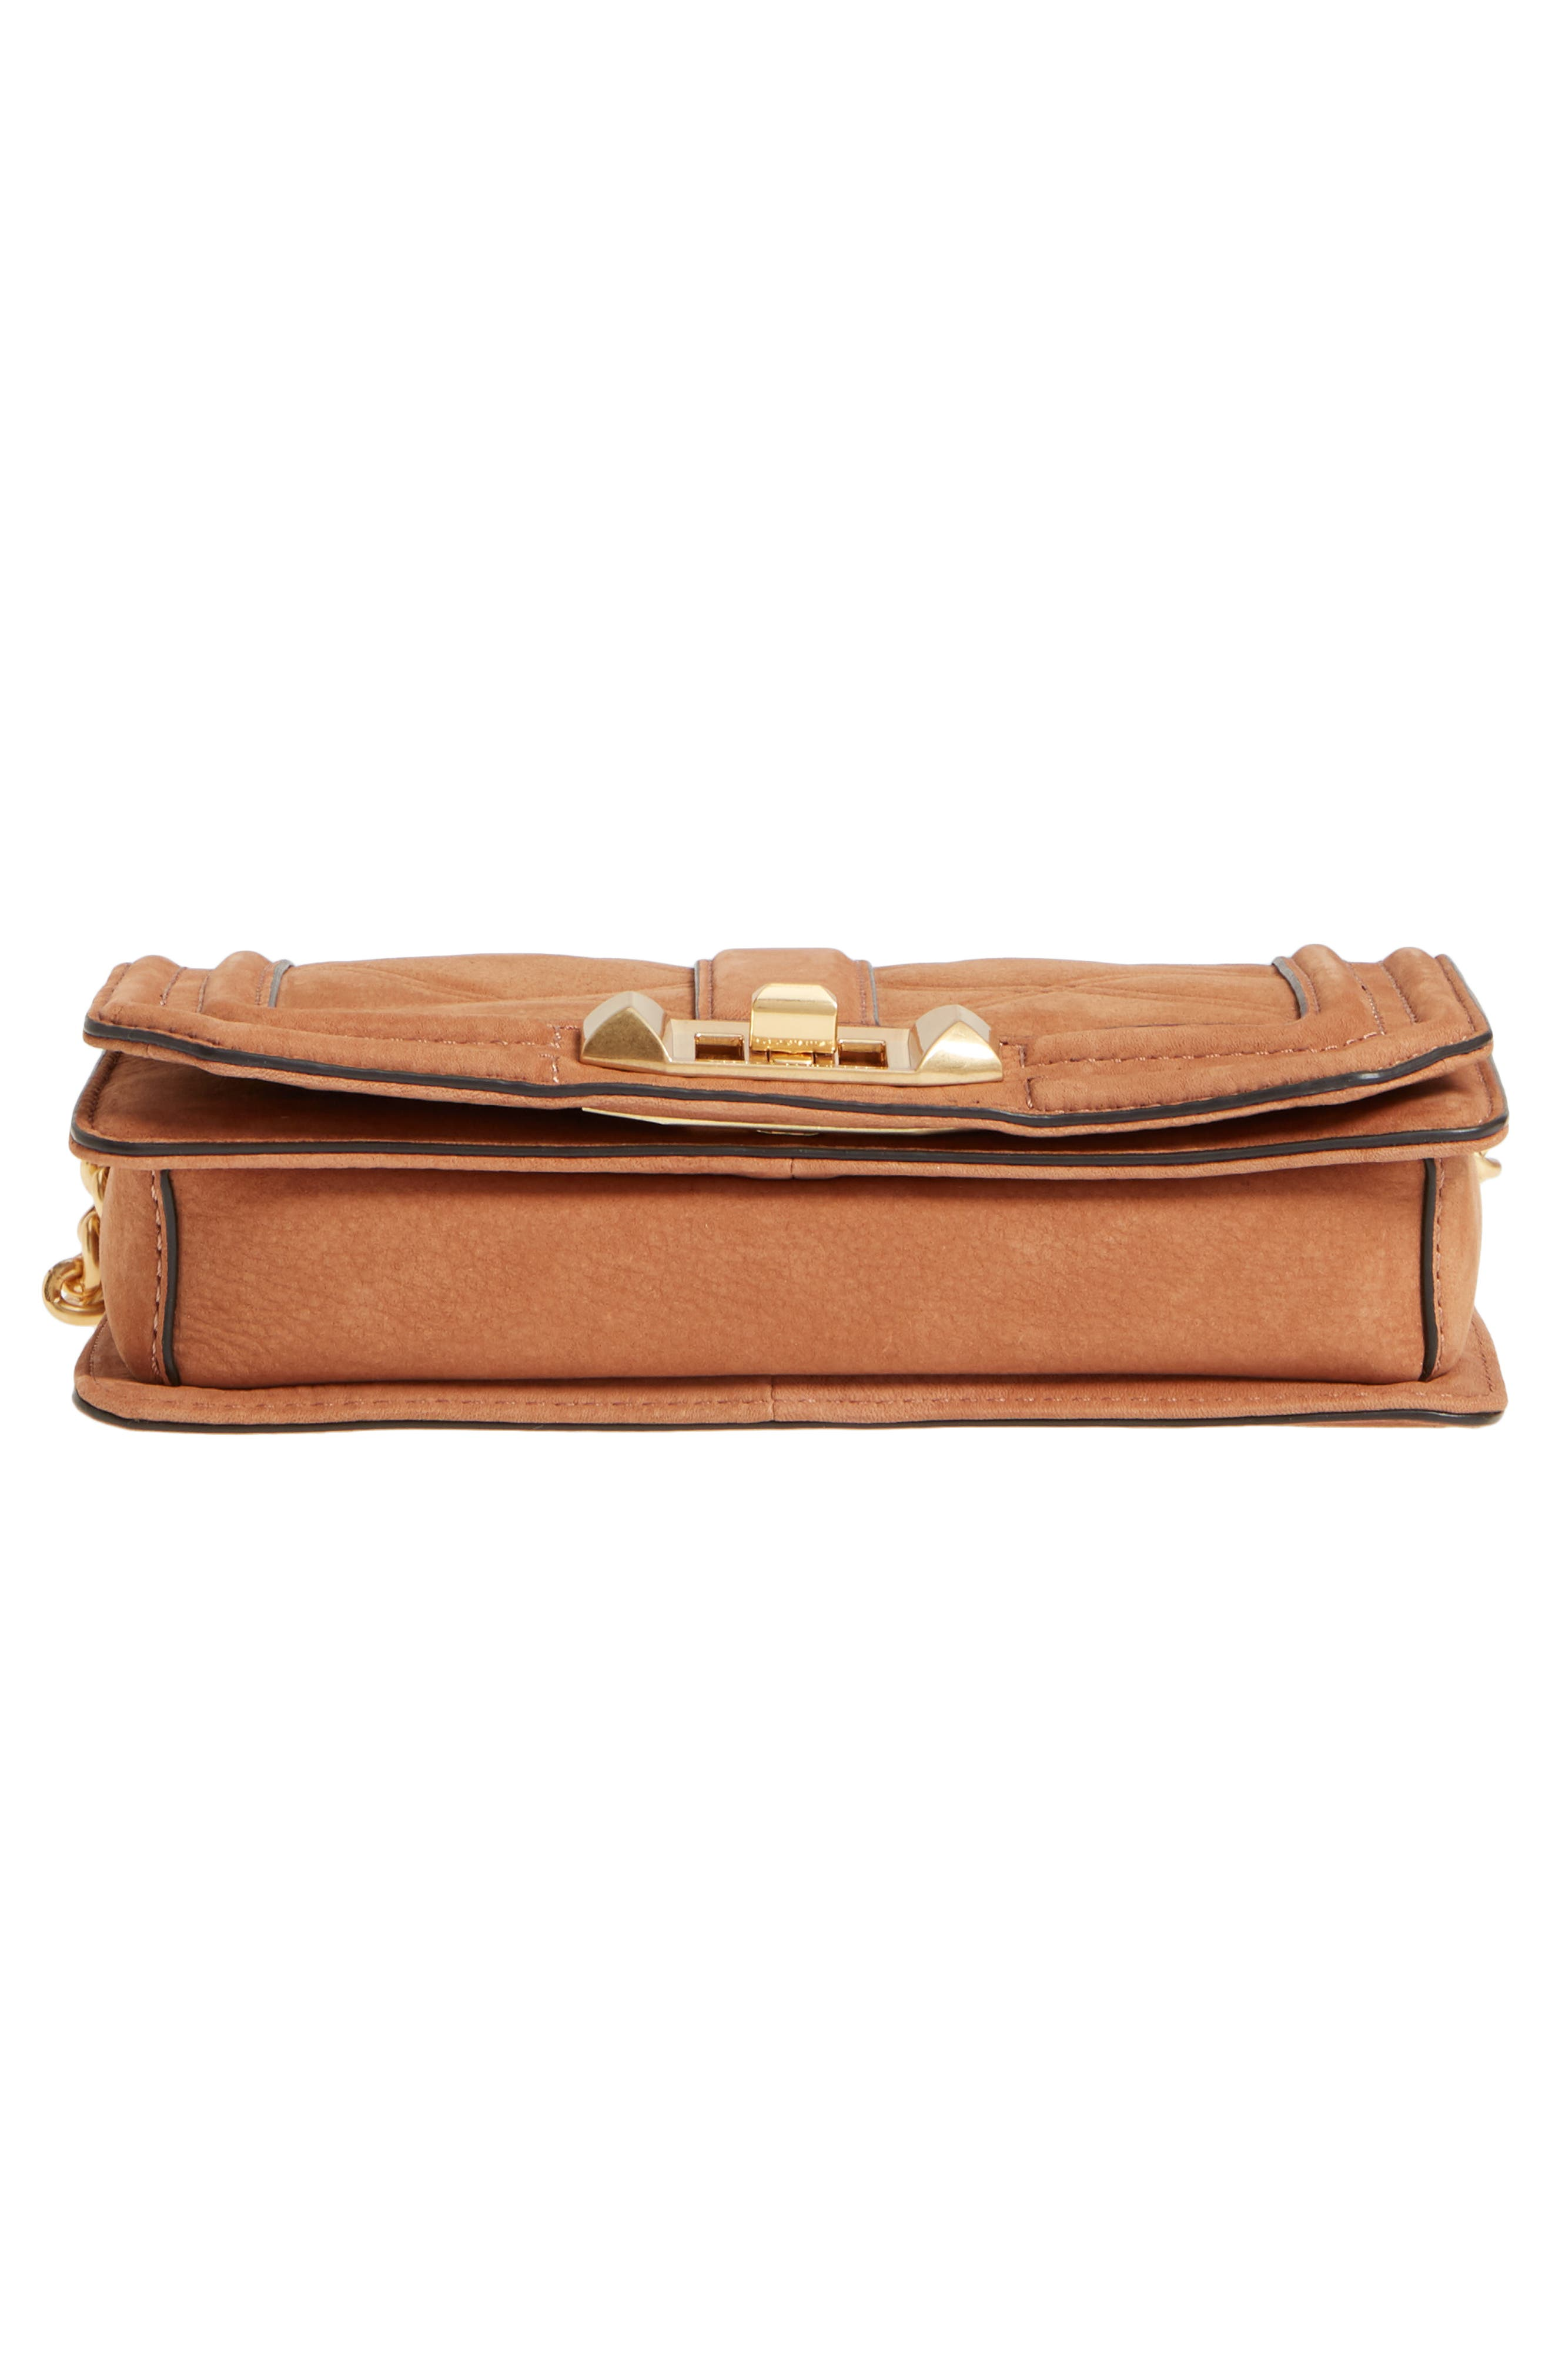 Small Love Nubuck Leather Crossbody Bag,                             Alternate thumbnail 7, color,                             Almond